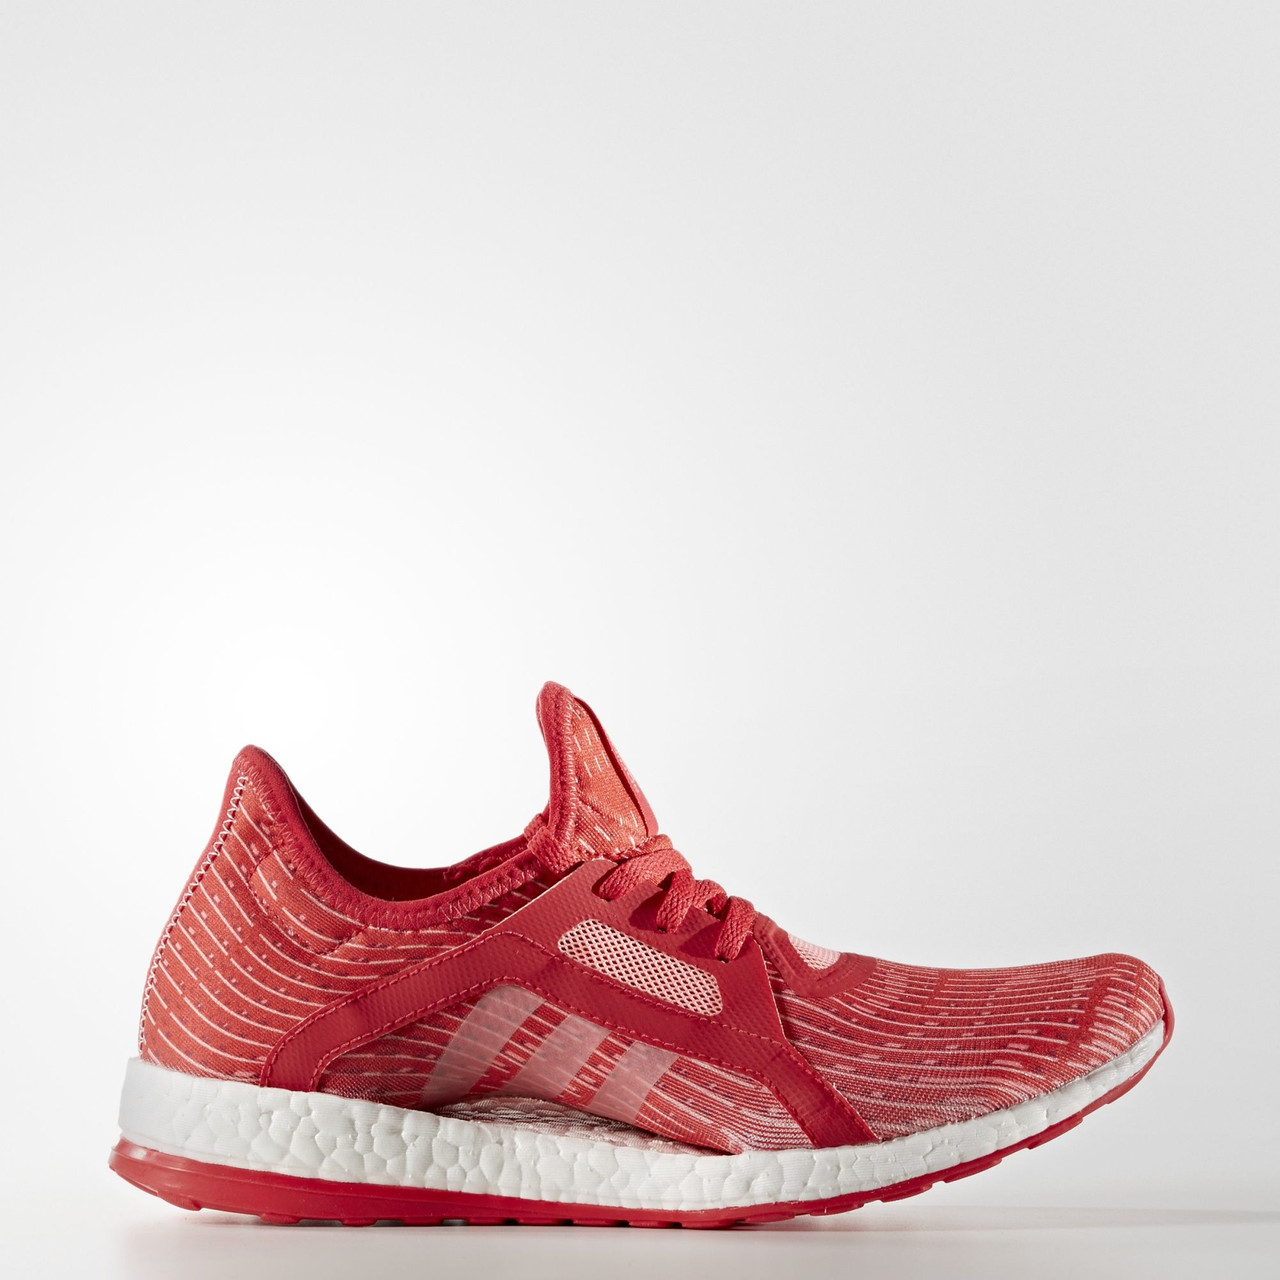 0d5d82f4 Купить Женские кроссовки для бега Adidas Pure Boost X (Артикул ...